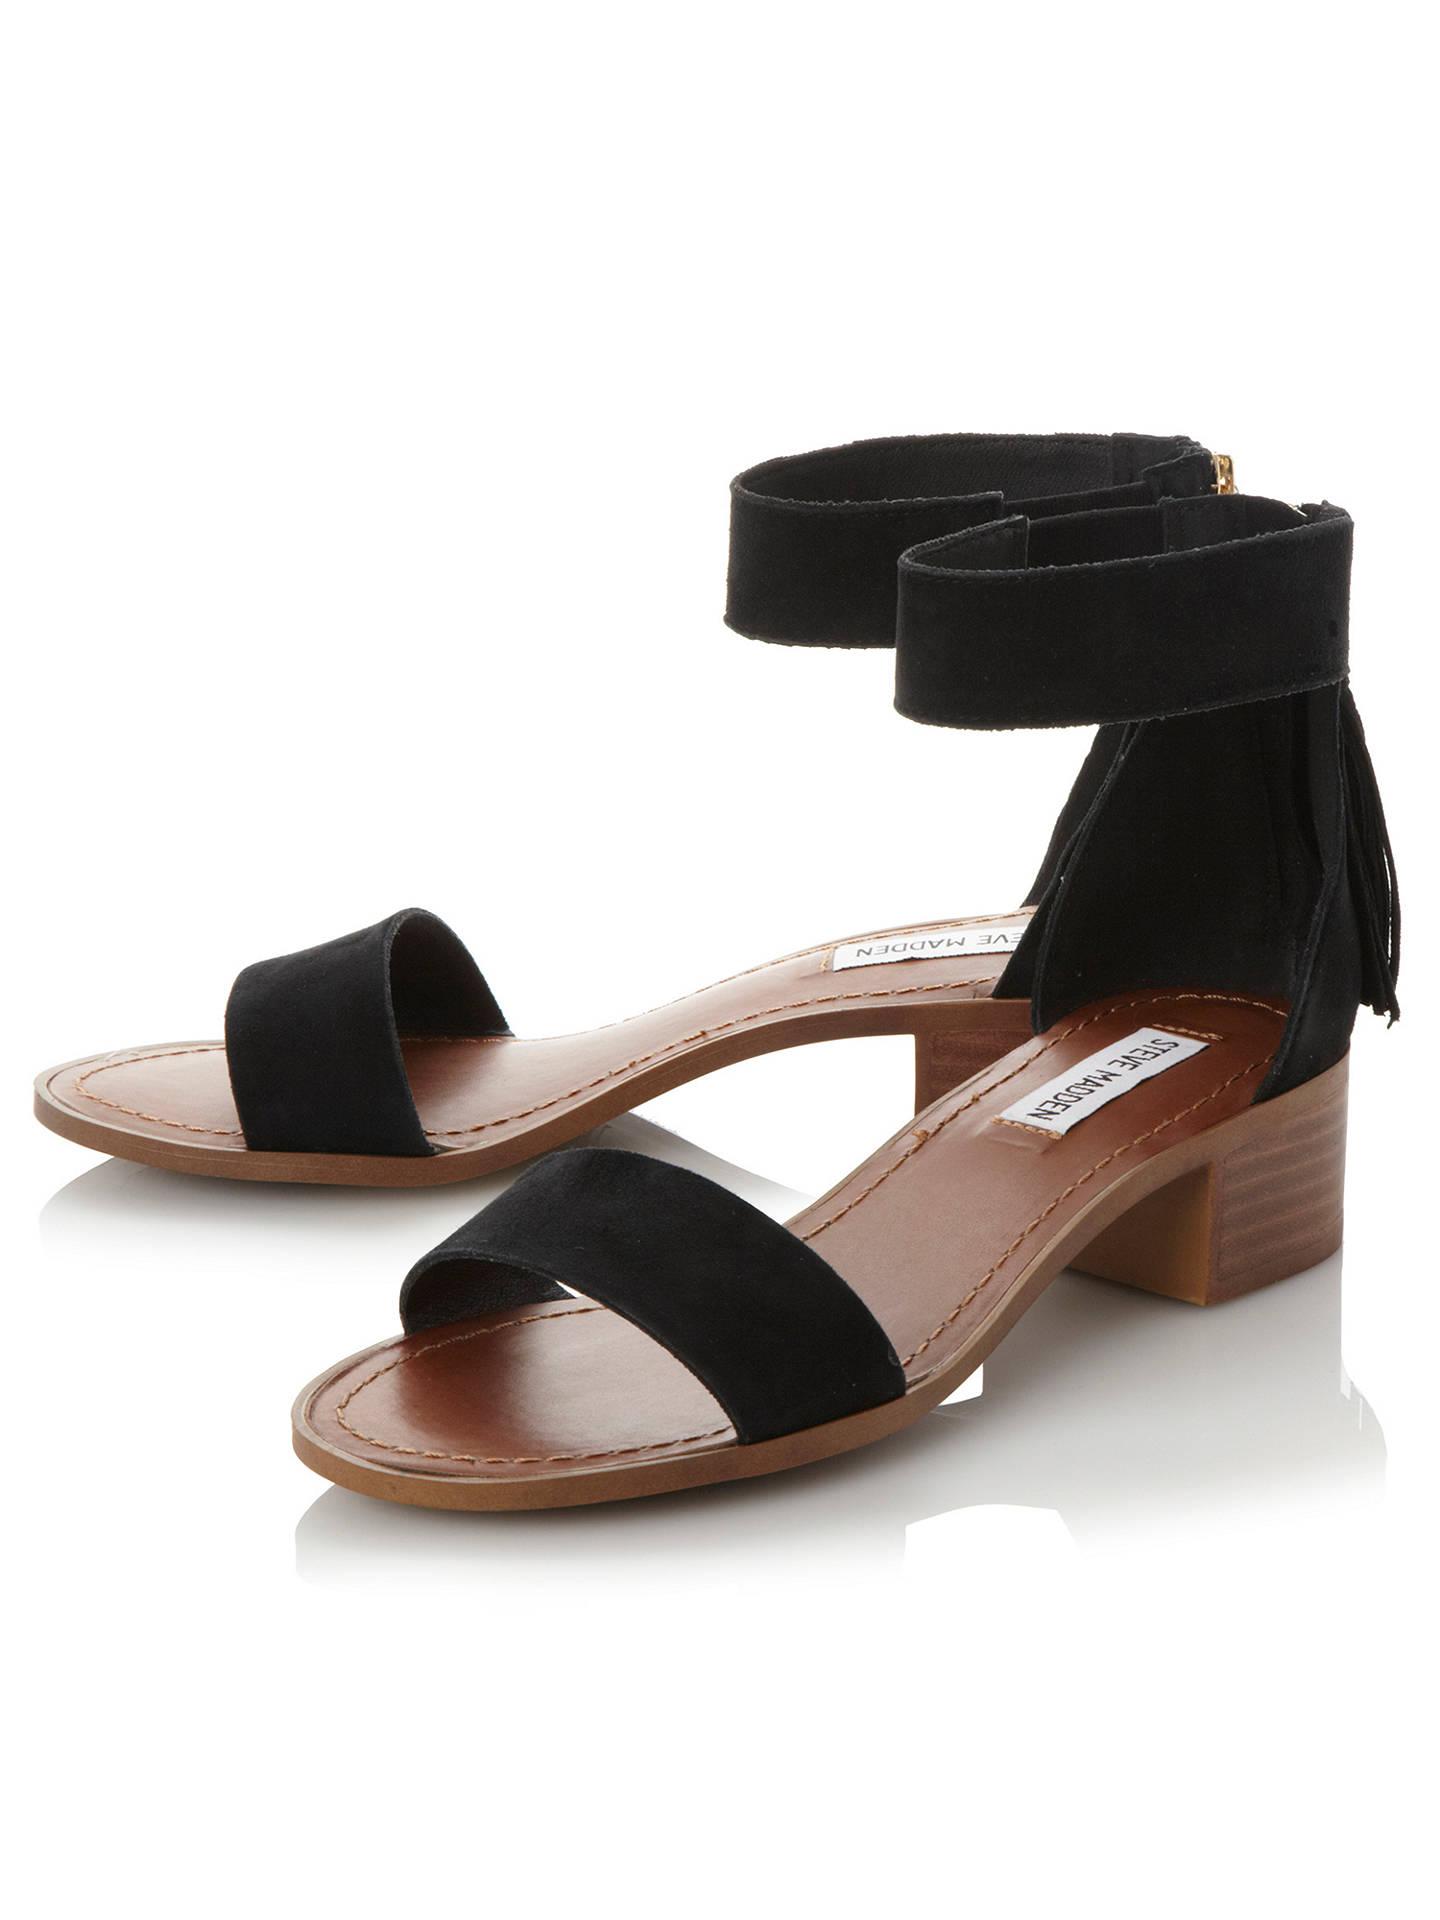 eb8e25a4320 Steve Madden Darcie Block Heeled Sandals at John Lewis   Partners